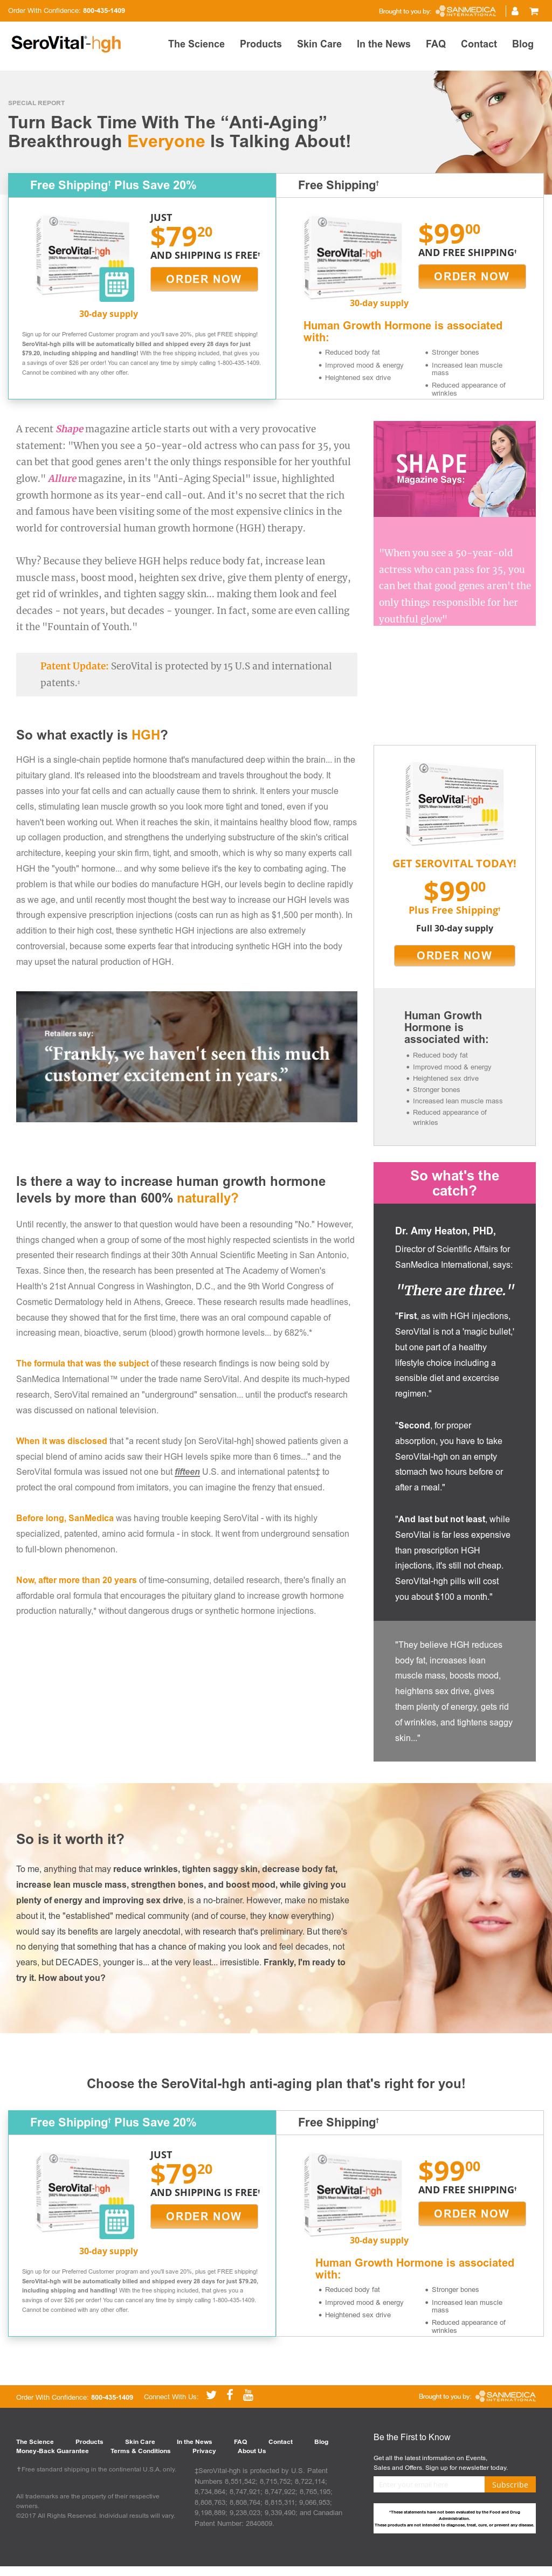 Owler Reports - SeroVital Blog Why SeroVital®-hgh Is Worth It